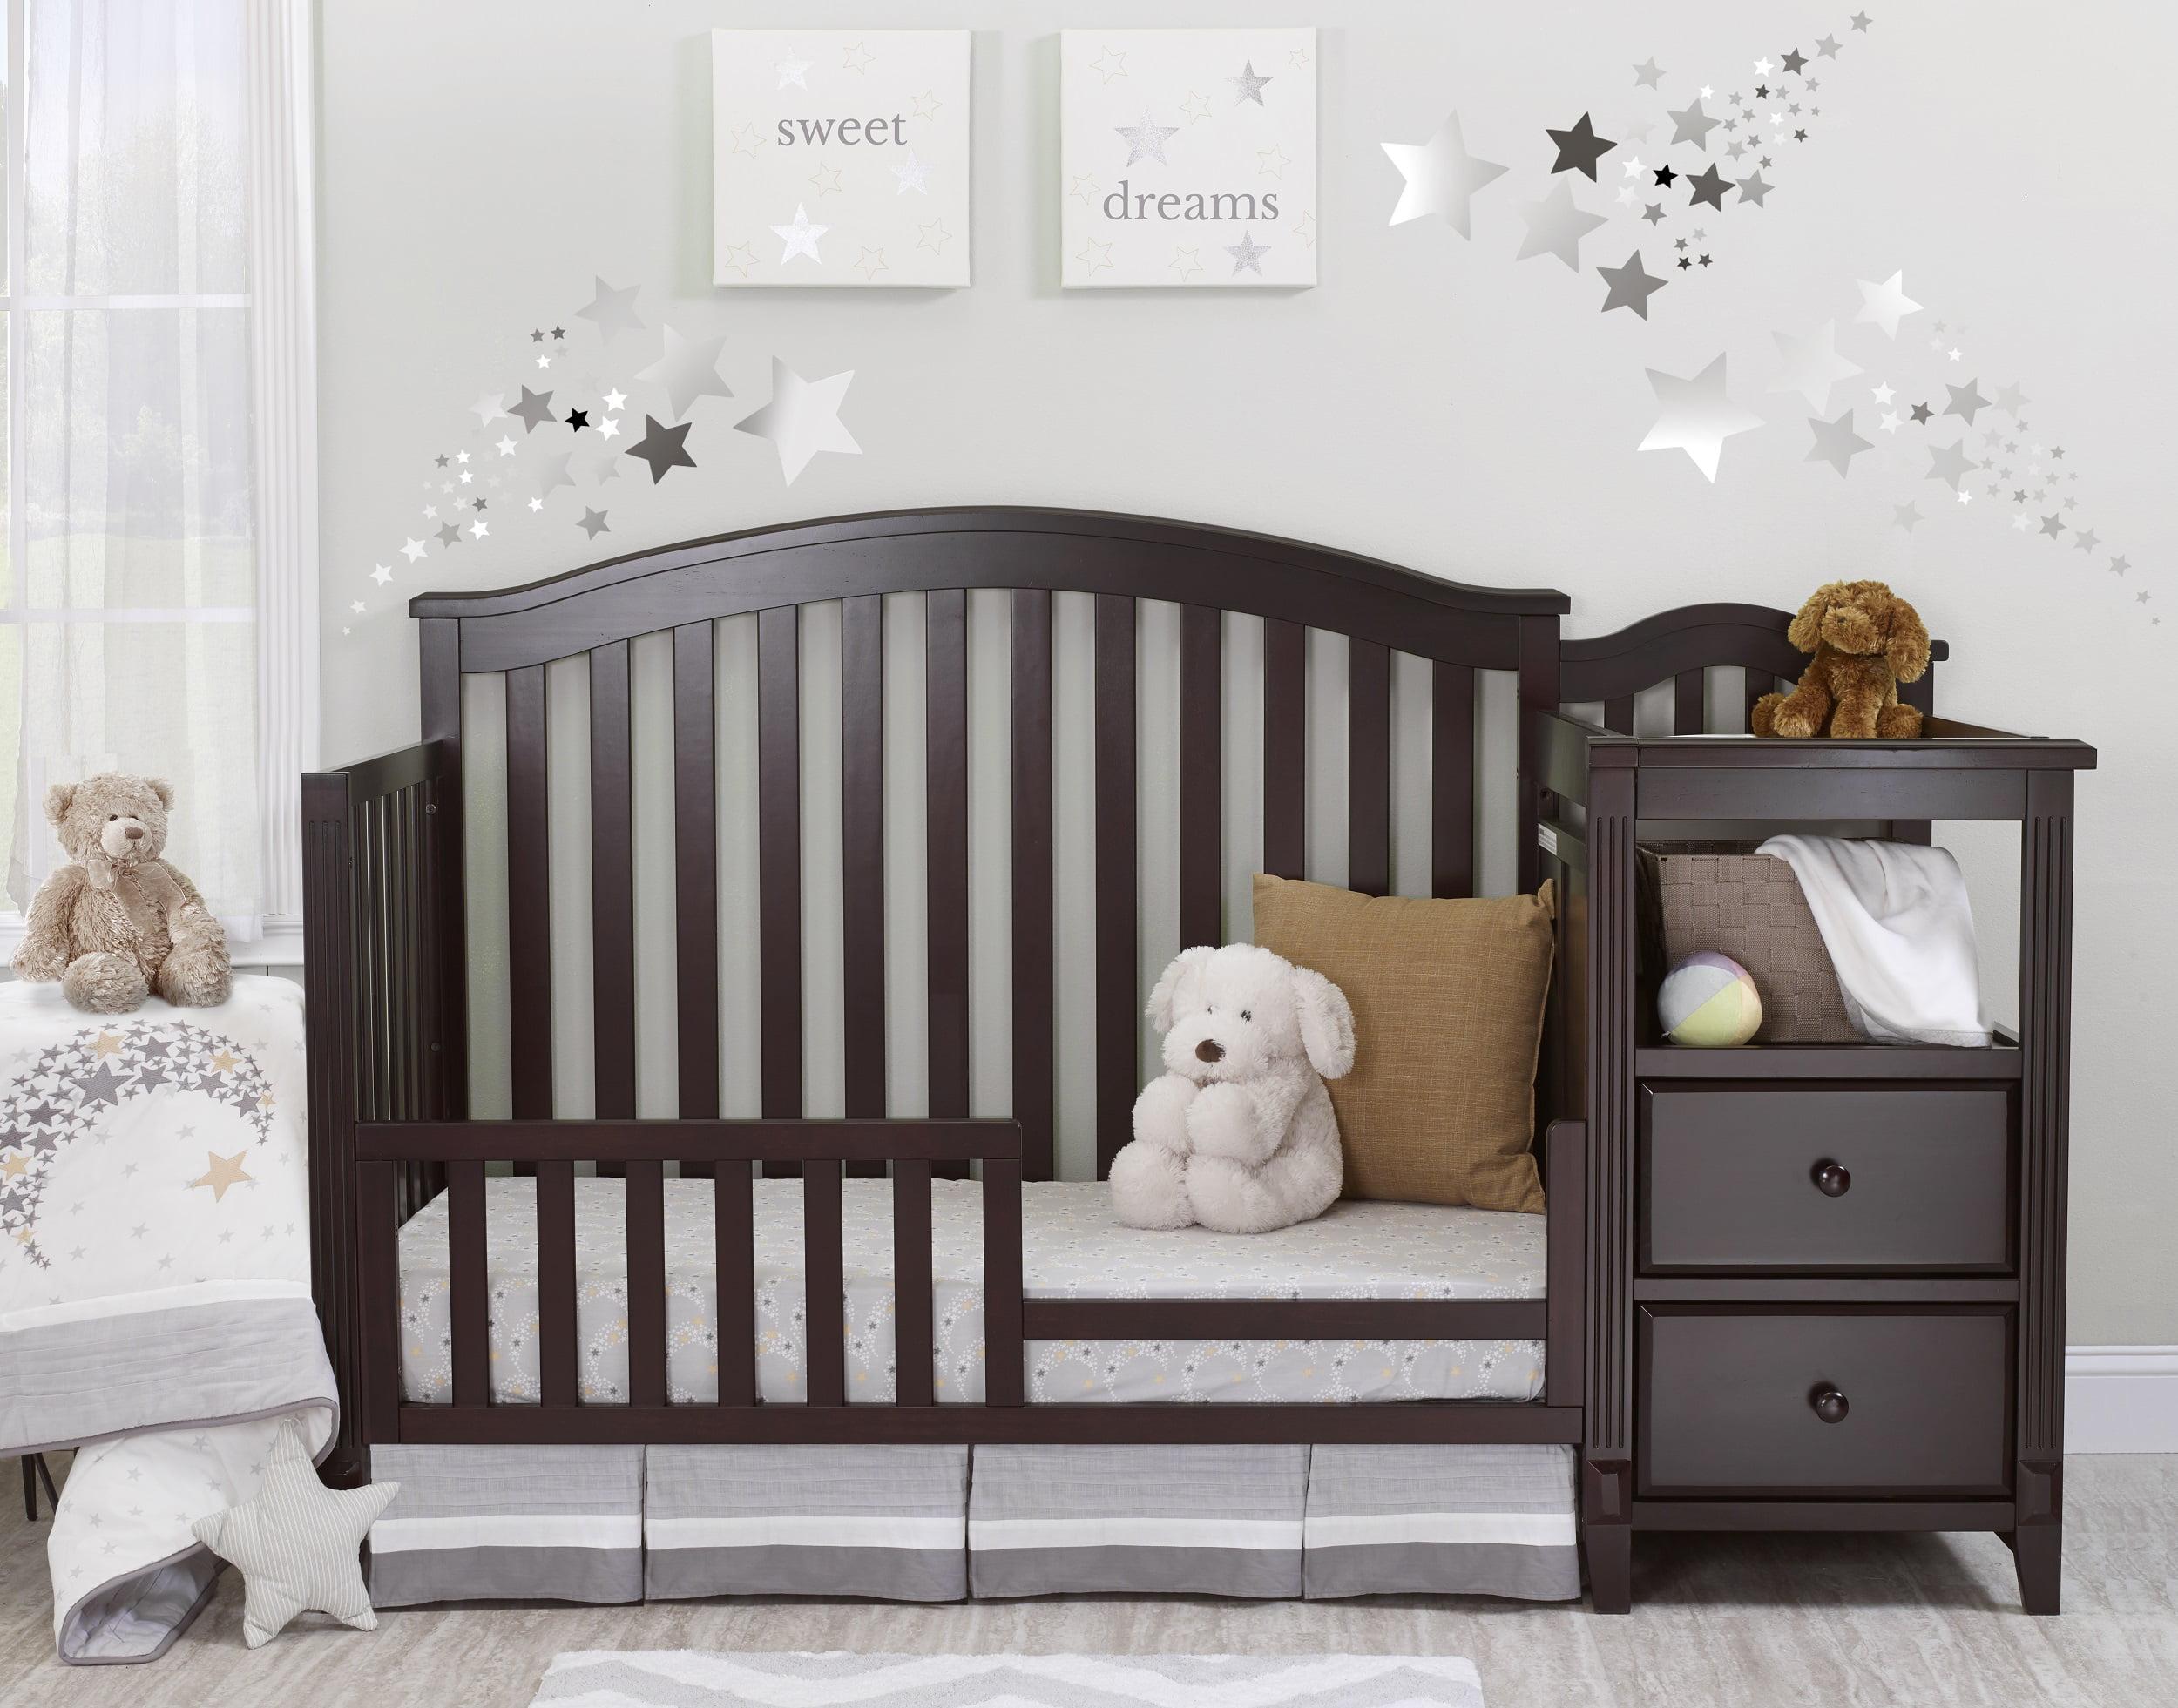 Sorelle Berkley 4 In 1 Convertible Crib And Changer Espresso Walmart Com Walmart Com